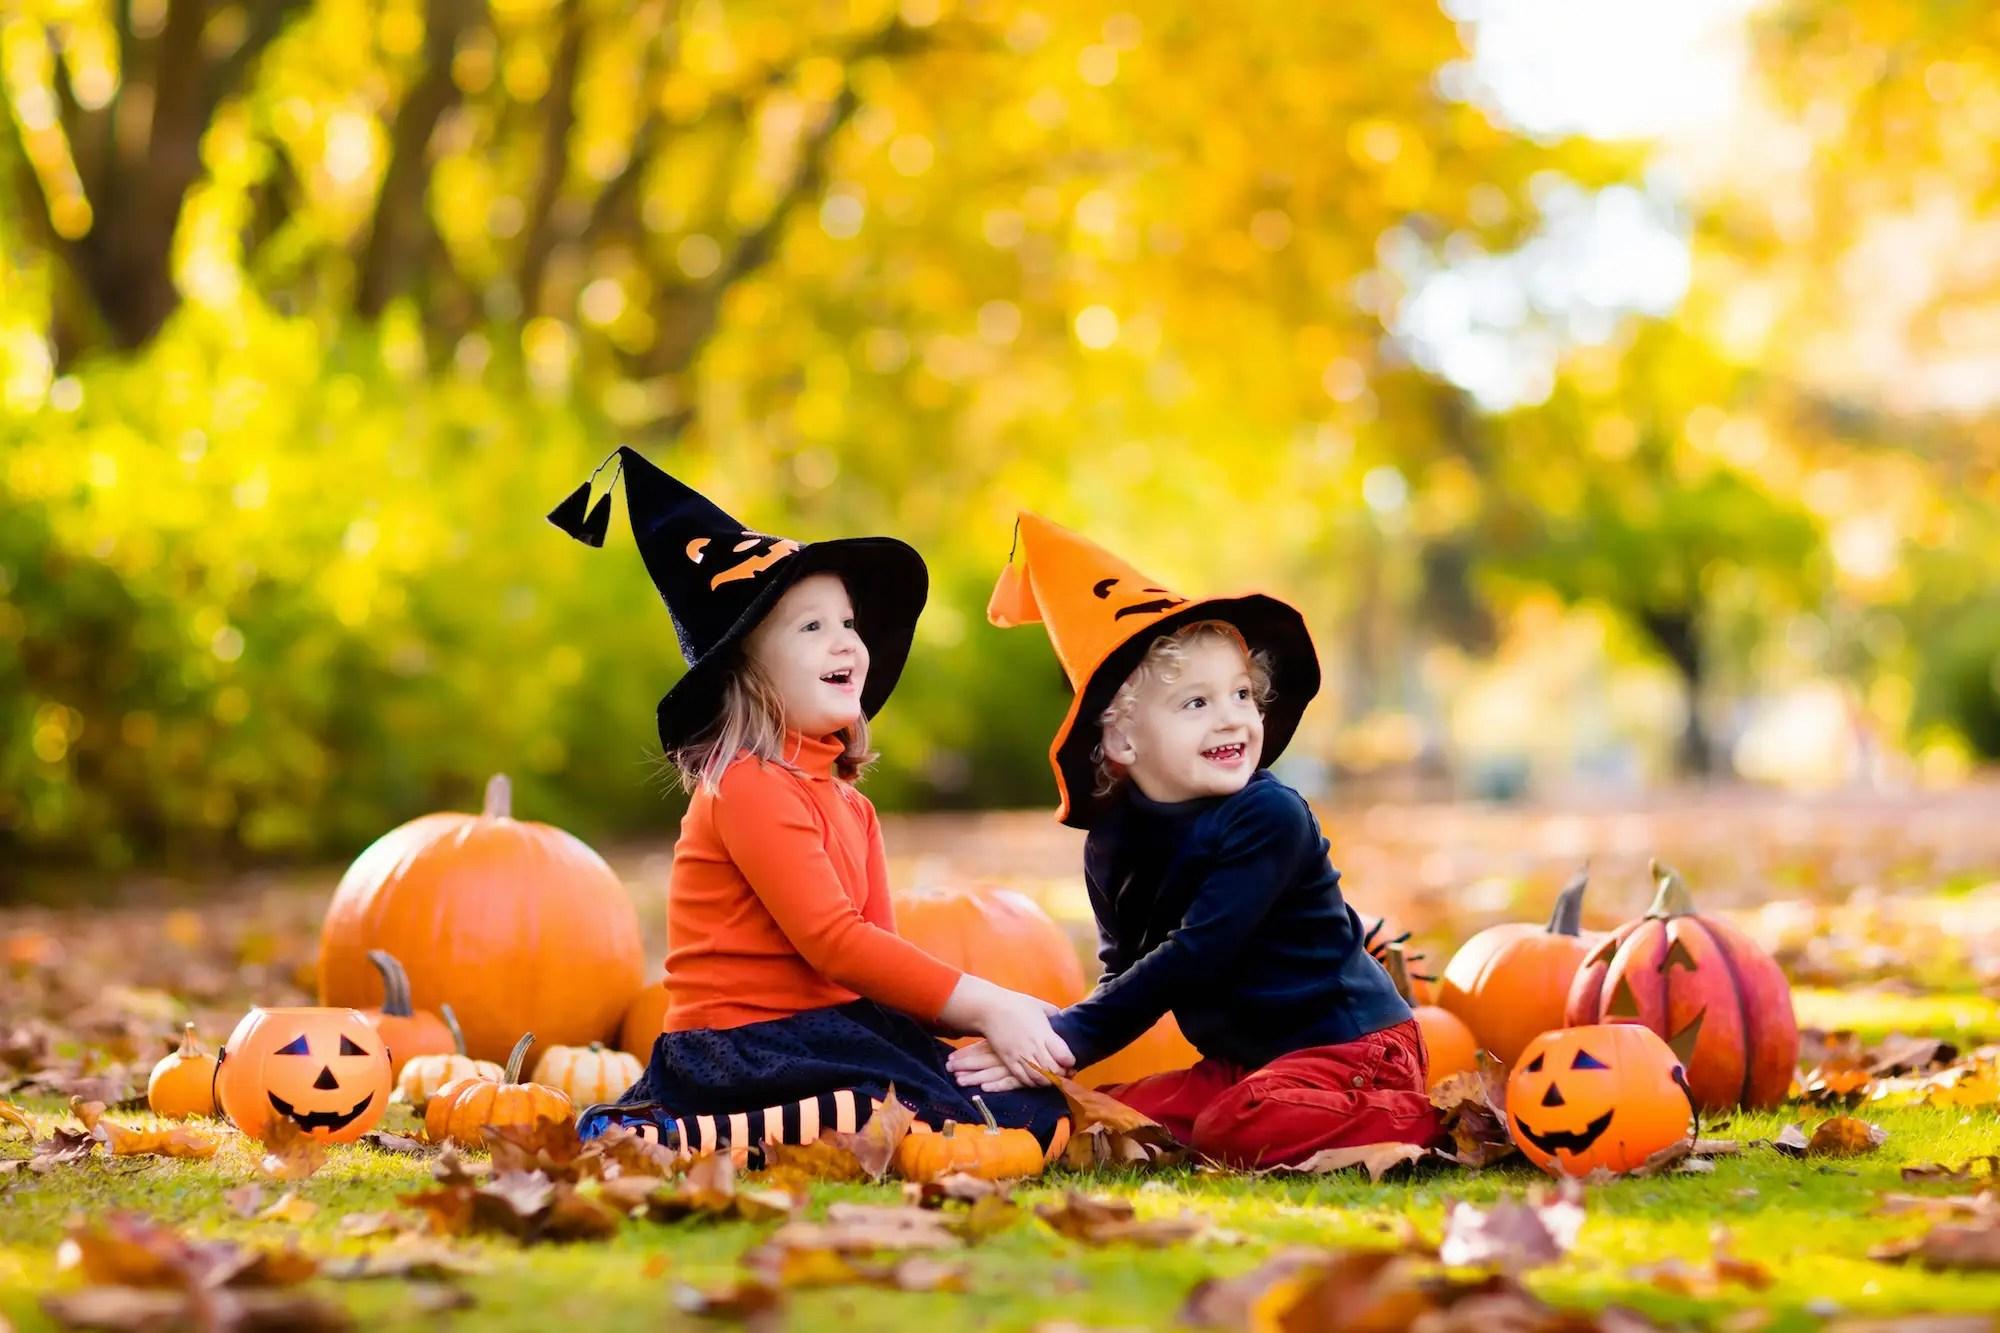 16 Adorable Diy Halloween Costumes For Kids